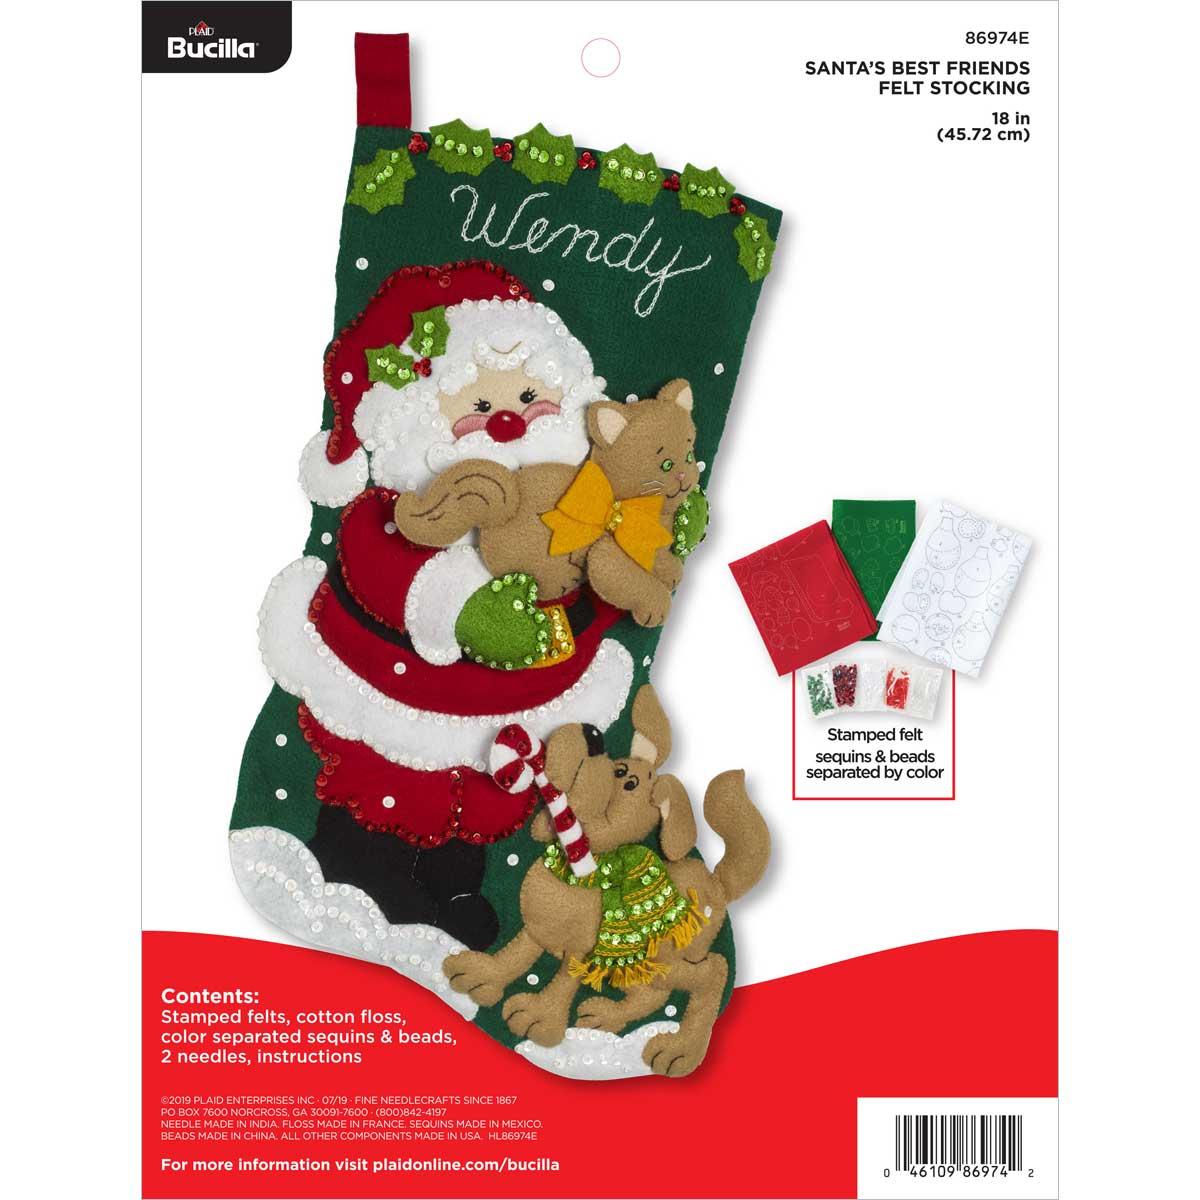 Bucilla ® Seasonal - Felt - Stocking Kits - Santa's Best Friend